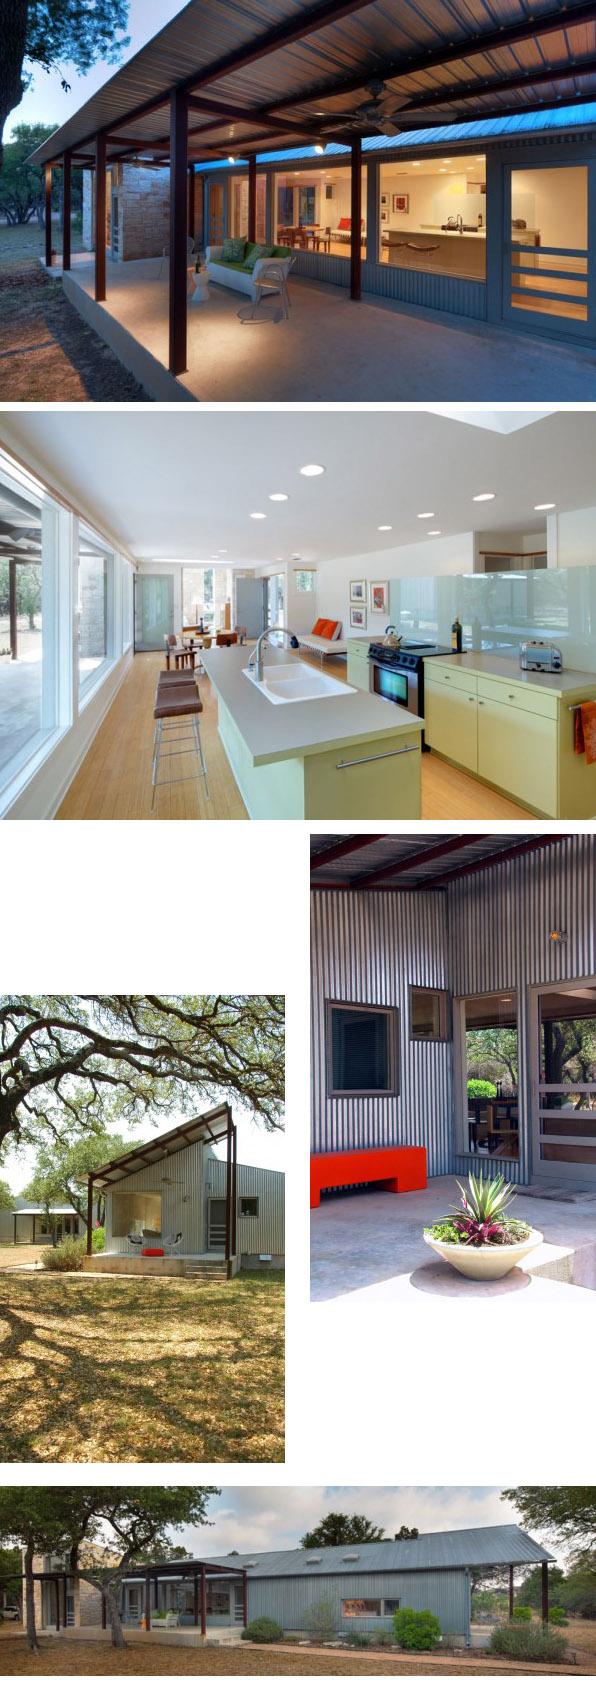 01_Walkabout_house_by_nick_deaver_architect_en_modus_vivendi